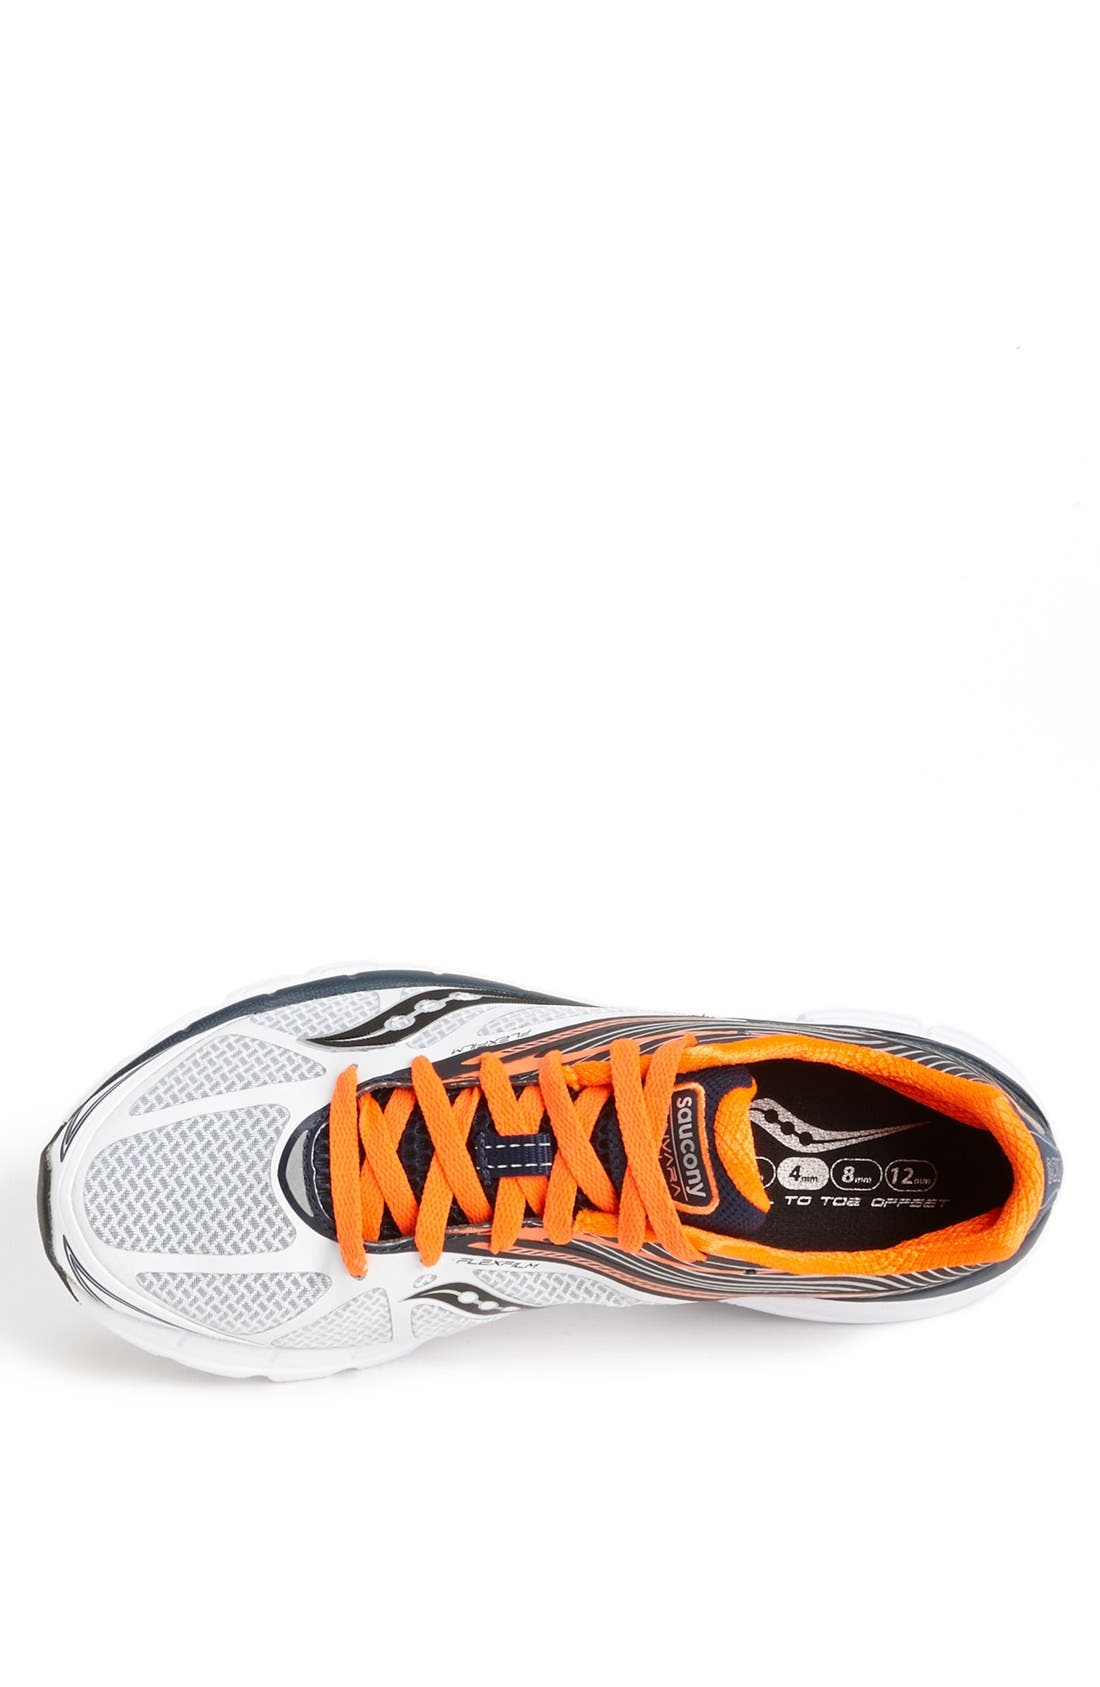 Alternate Image 3  - Saucony 'Kinvara 4' Running Shoe (Men)